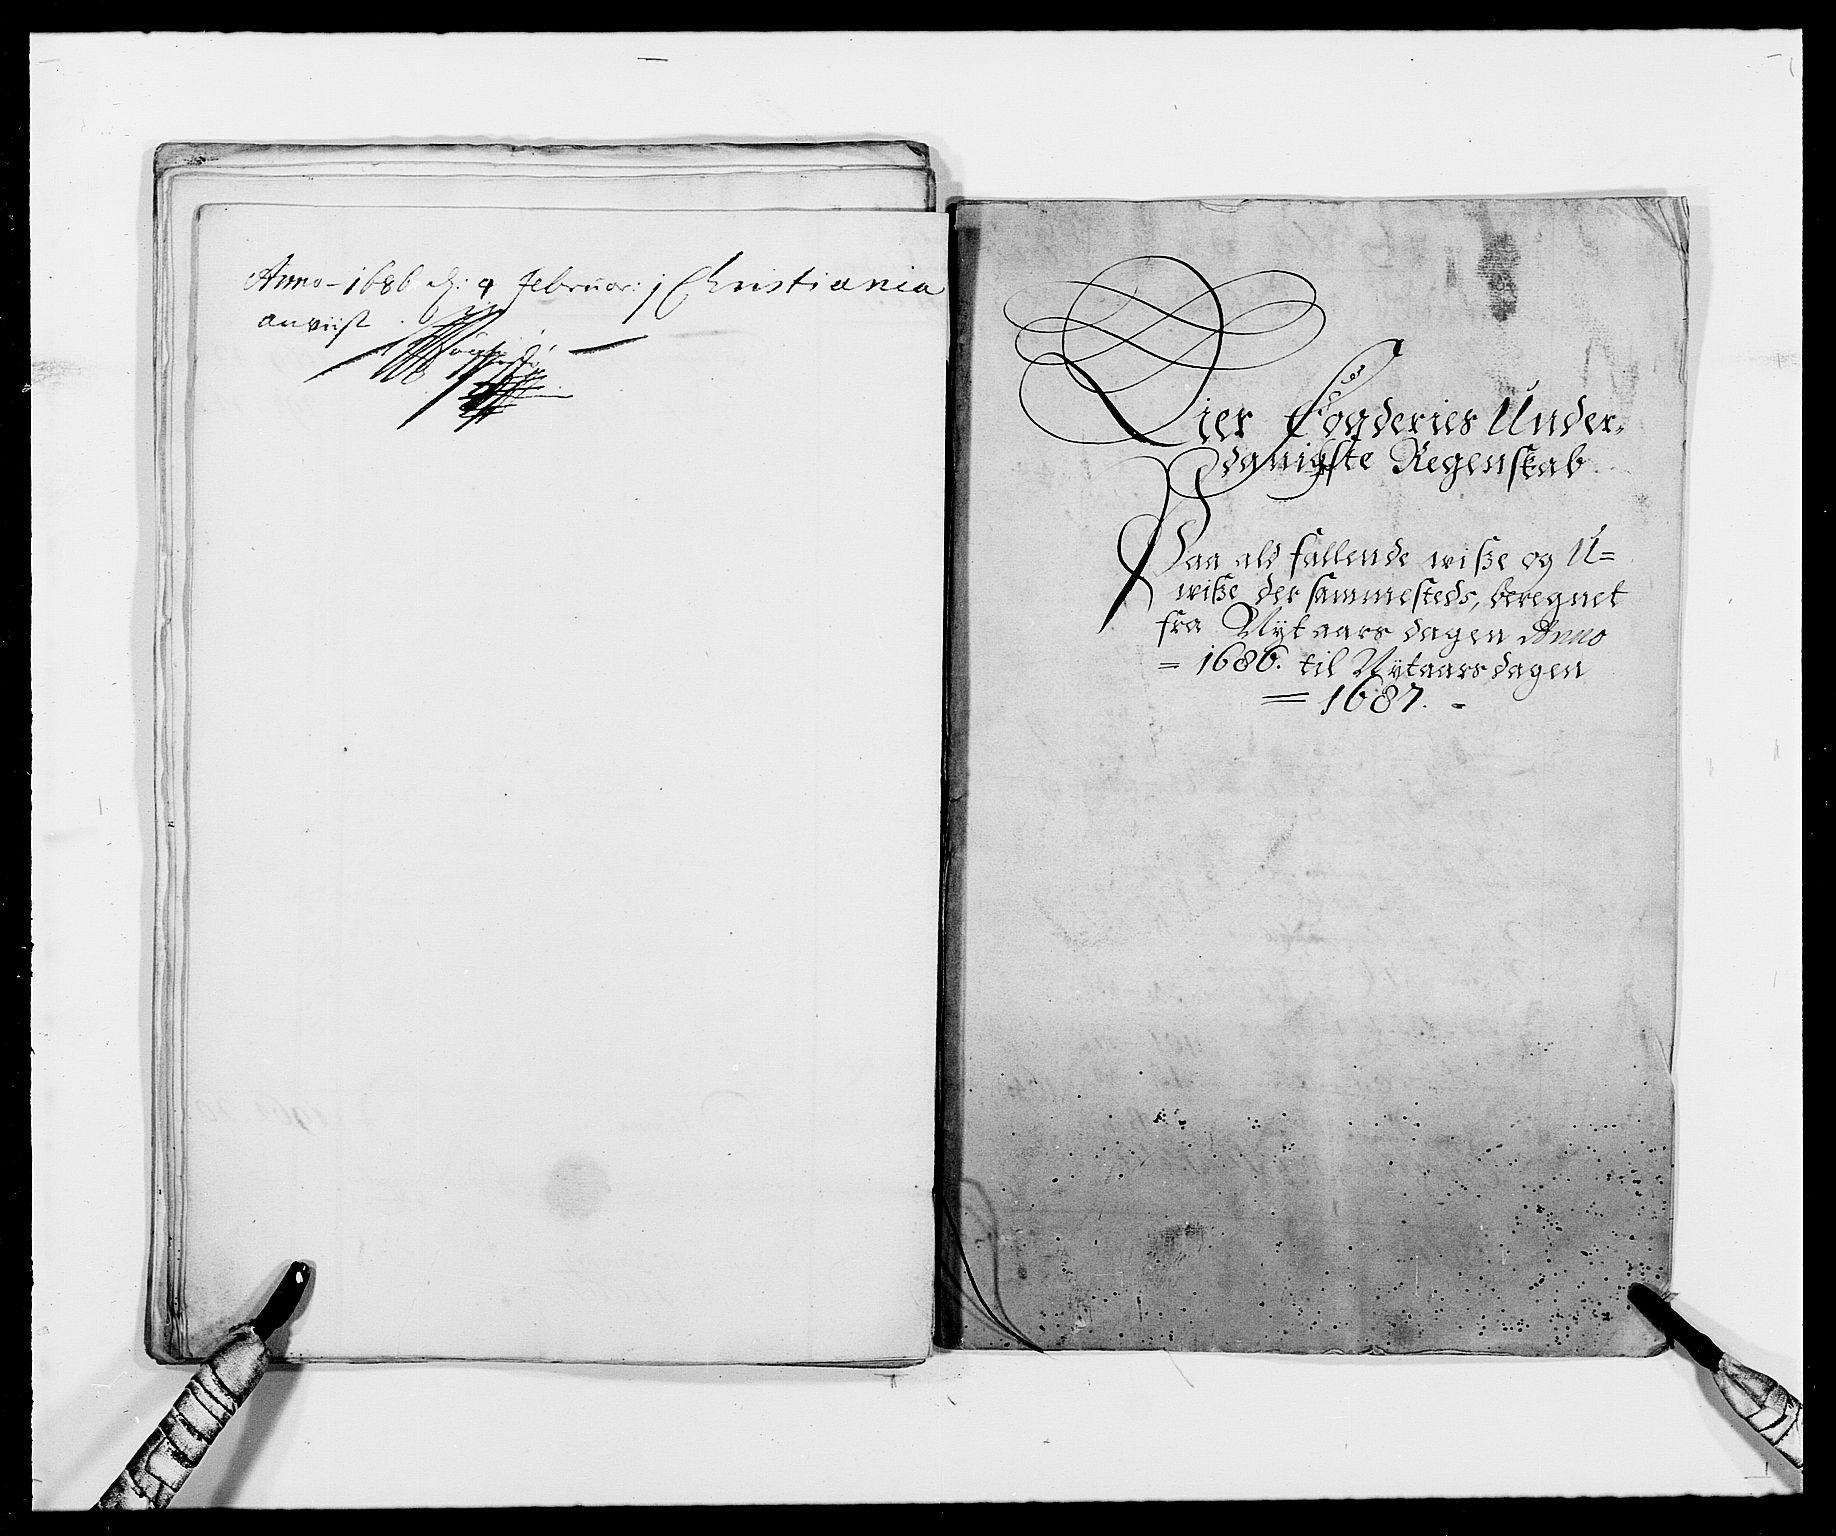 RA, Rentekammeret inntil 1814, Reviderte regnskaper, Fogderegnskap, R27/L1687: Fogderegnskap Lier, 1678-1686, s. 326